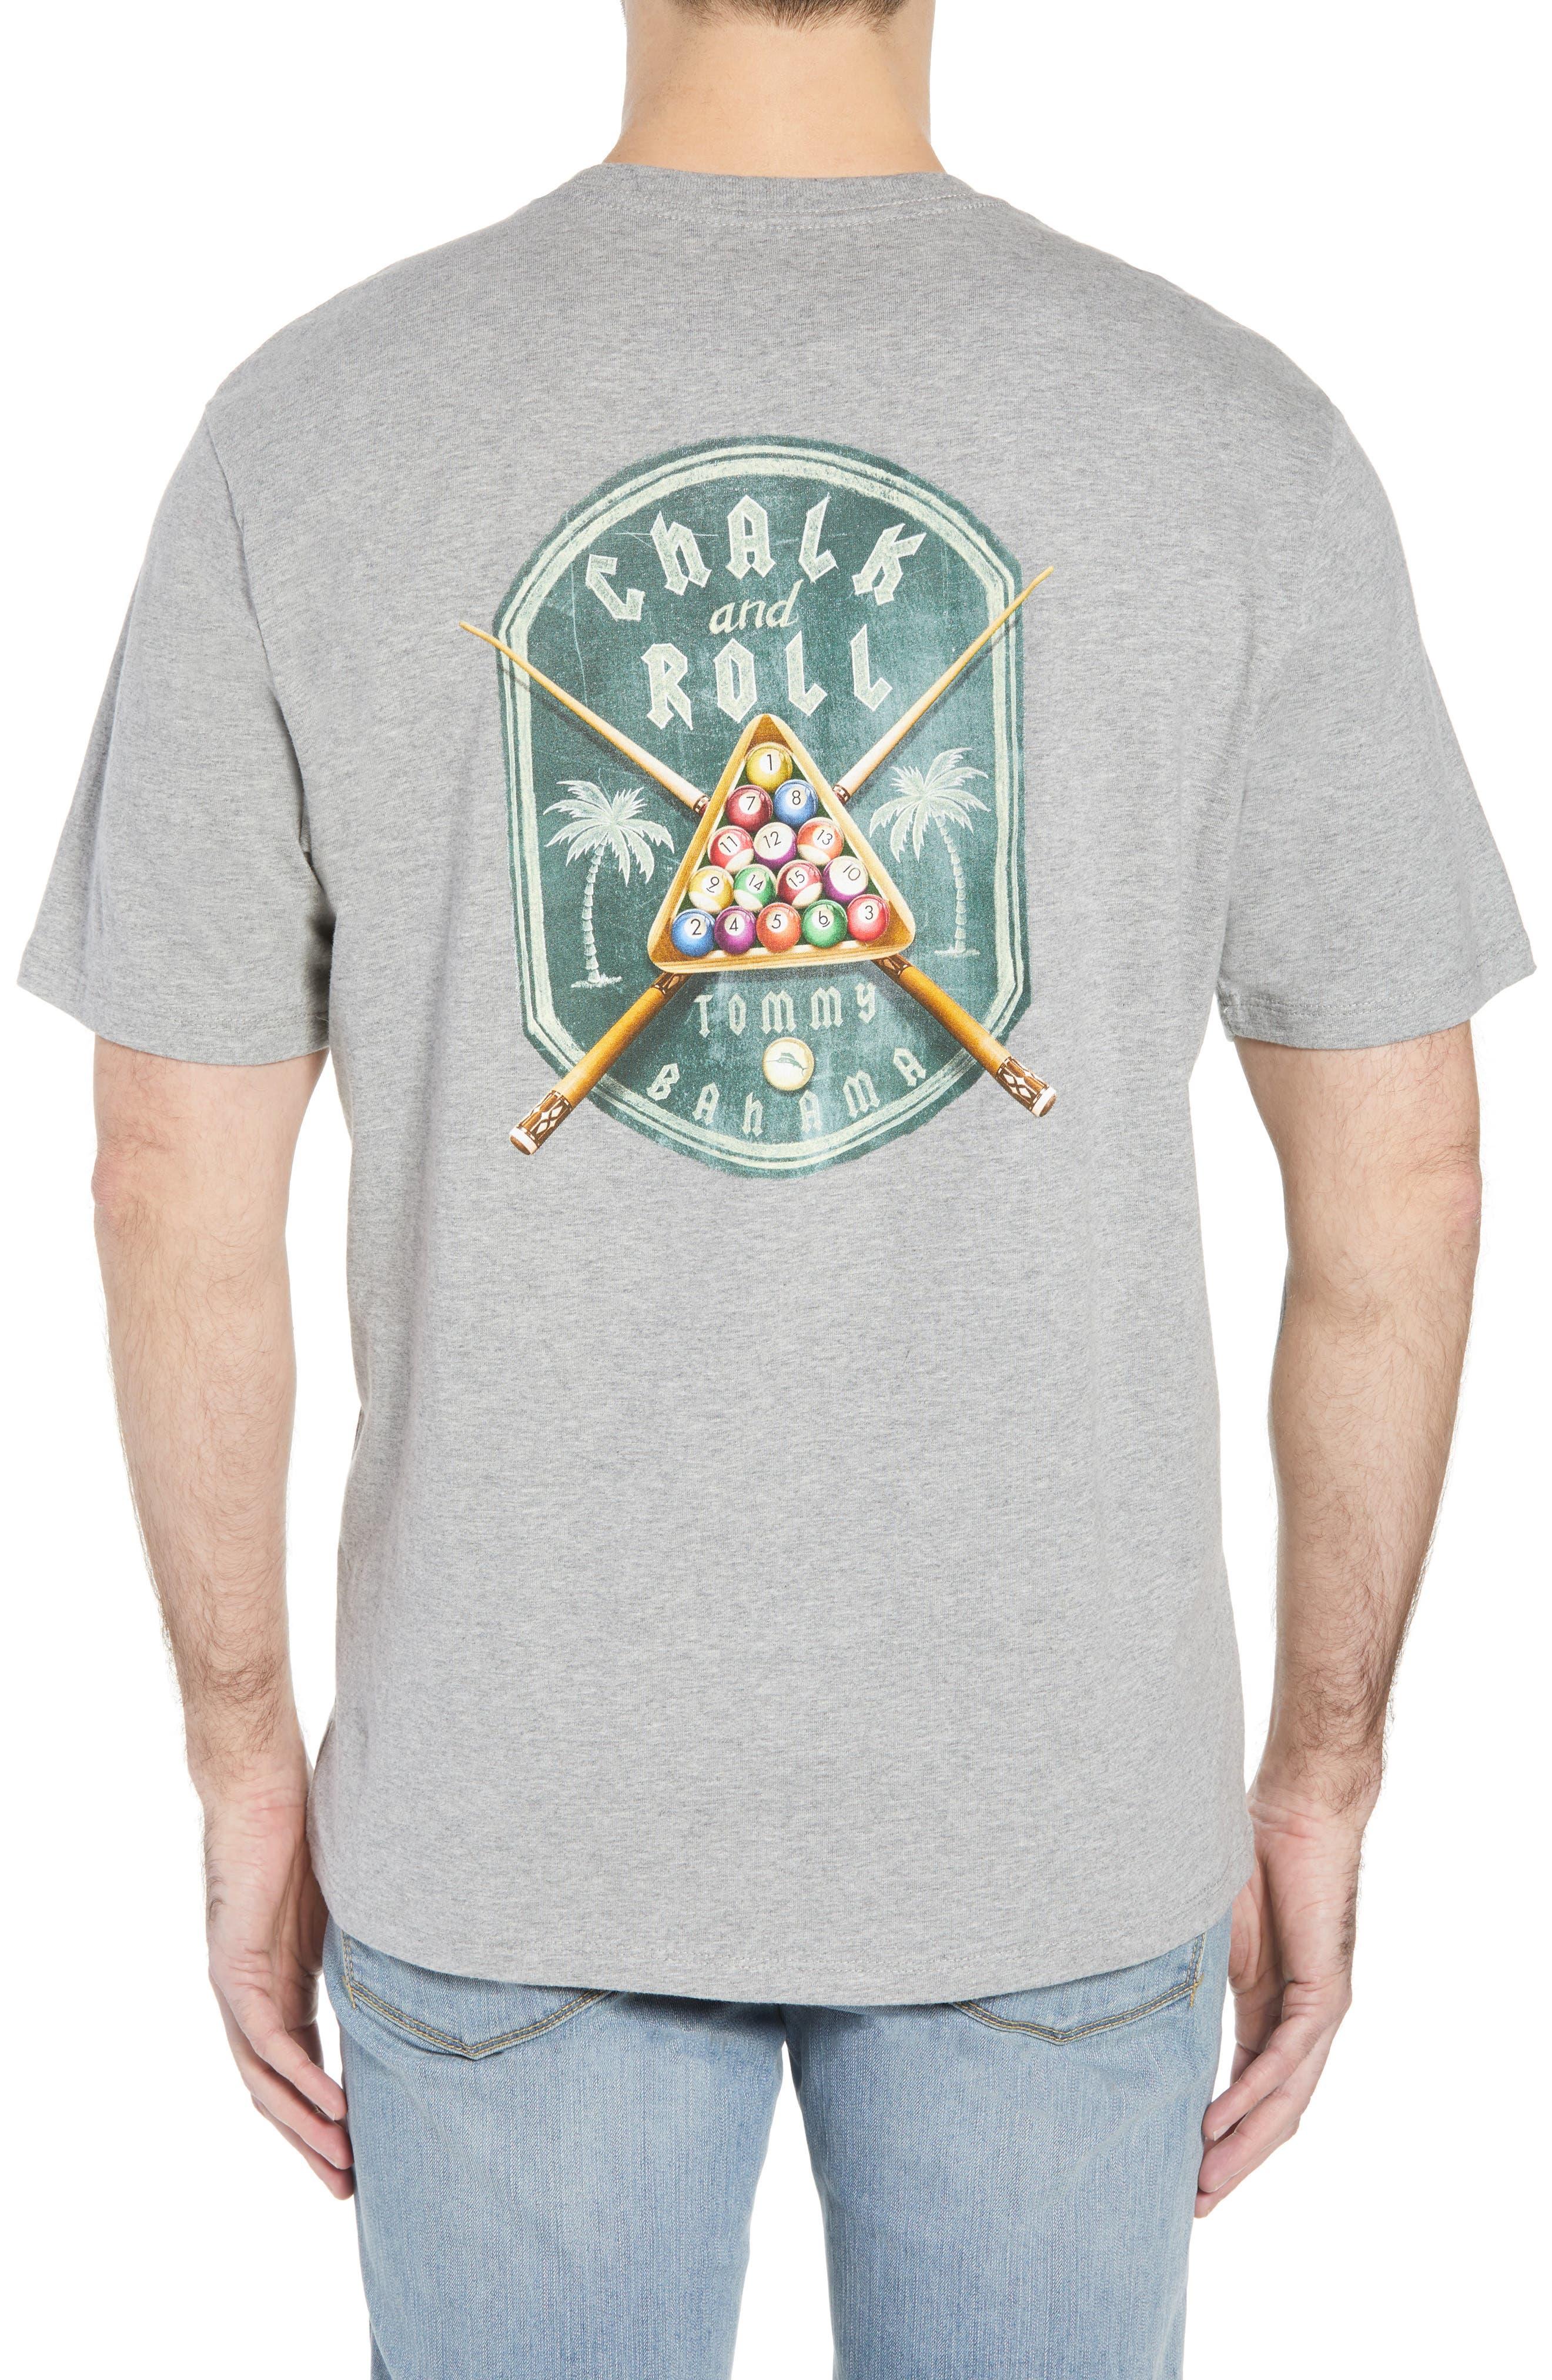 Chalk & Roll T-Shirt,                             Alternate thumbnail 2, color,                             Grey Heather